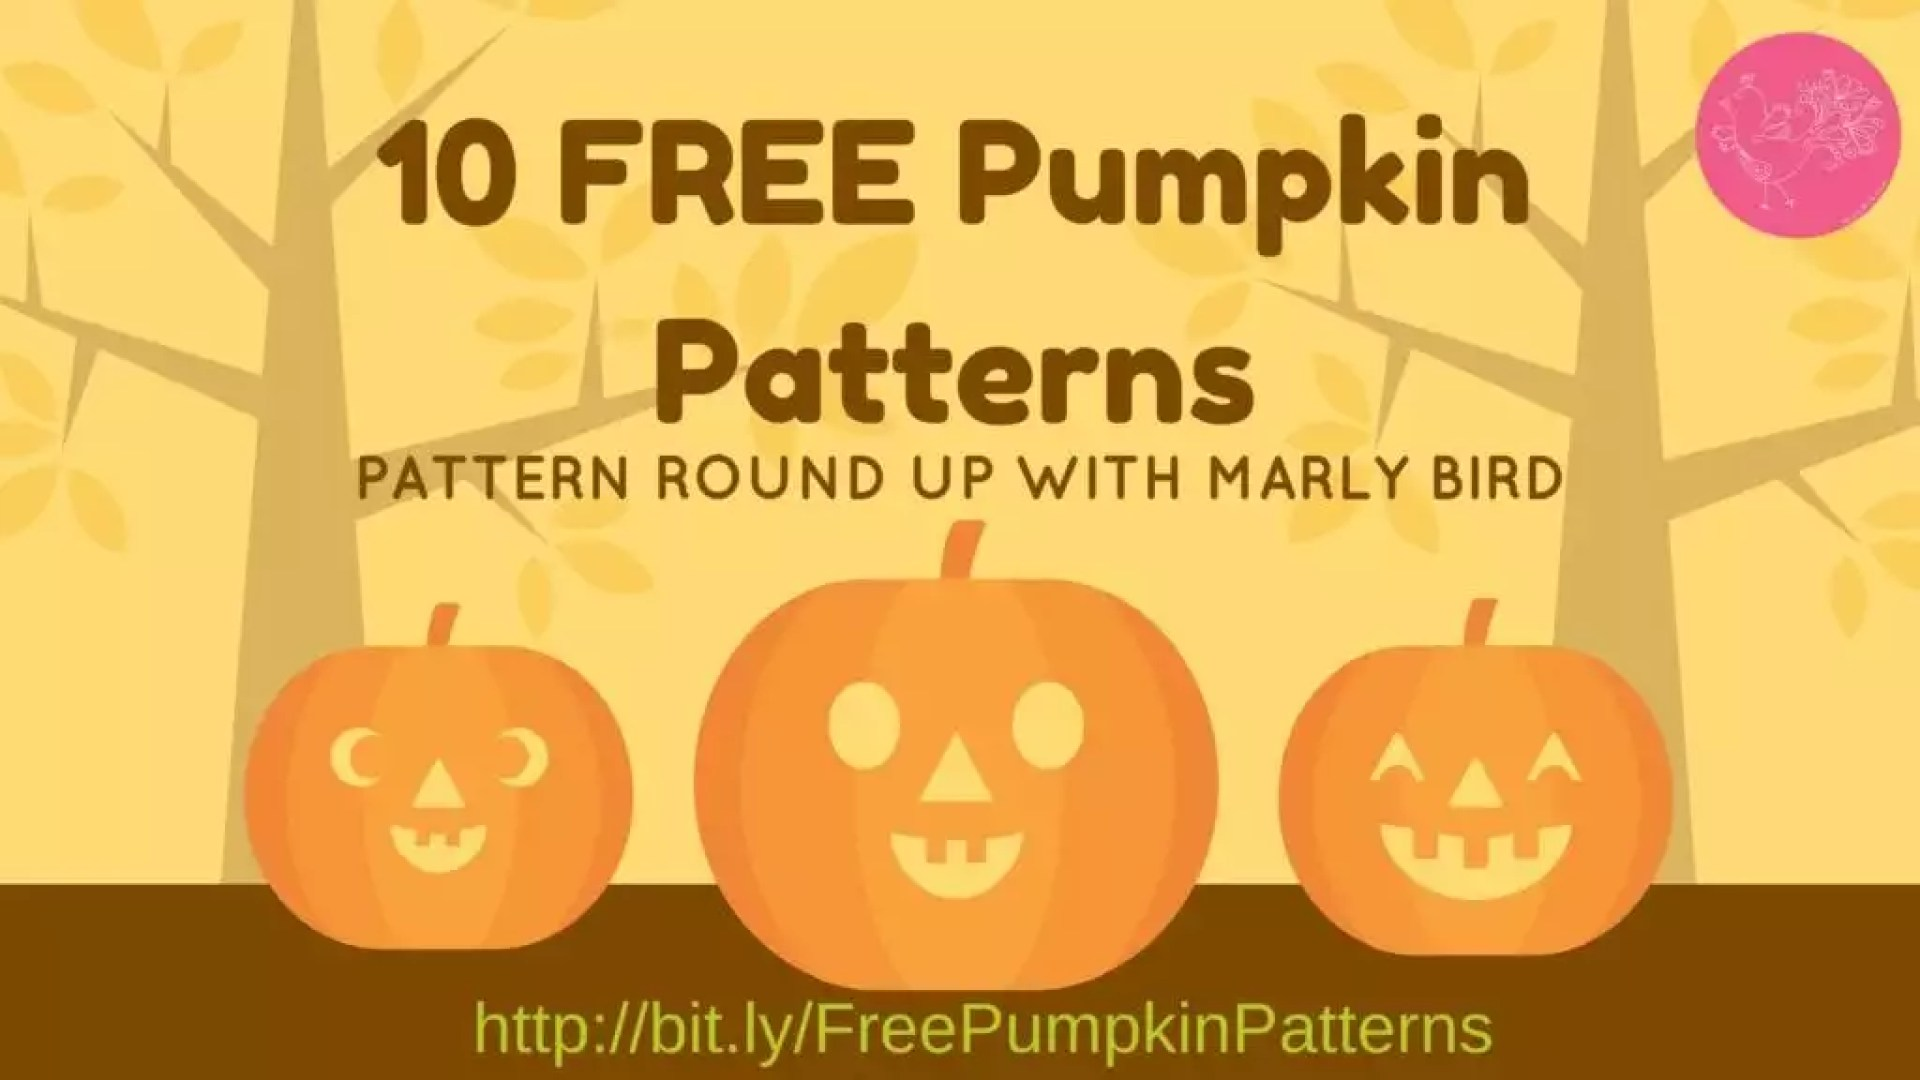 10 FREE Pumpkin Patterns